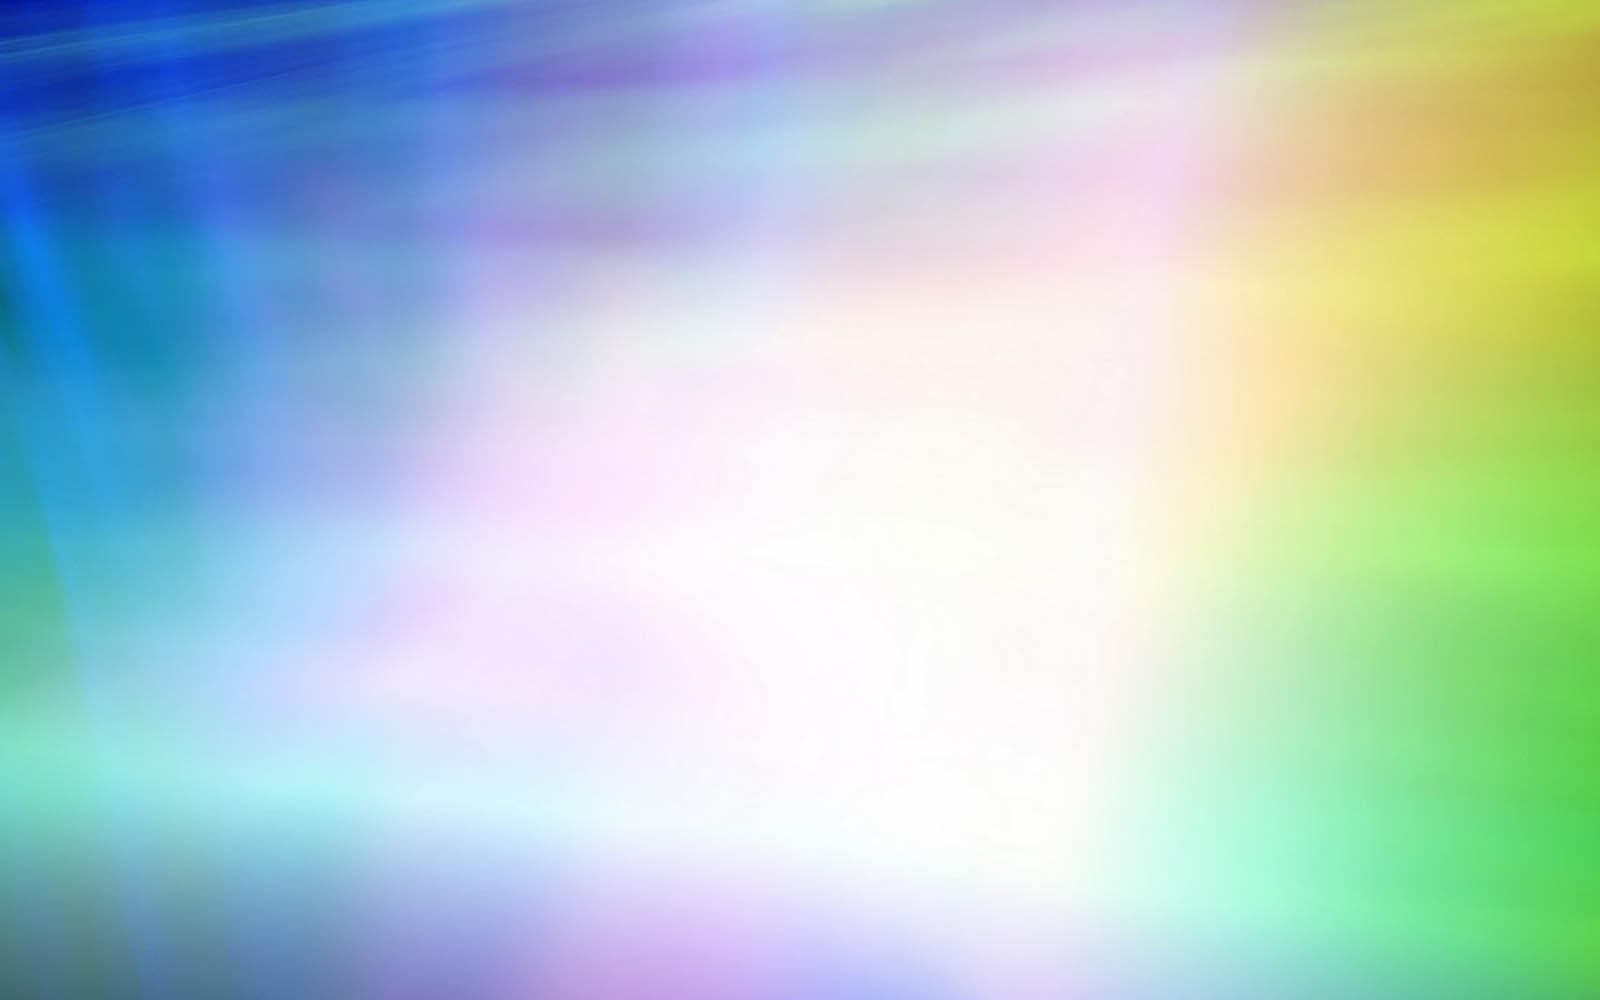 Colorful Wallpapers   Screensaver 1600x1000